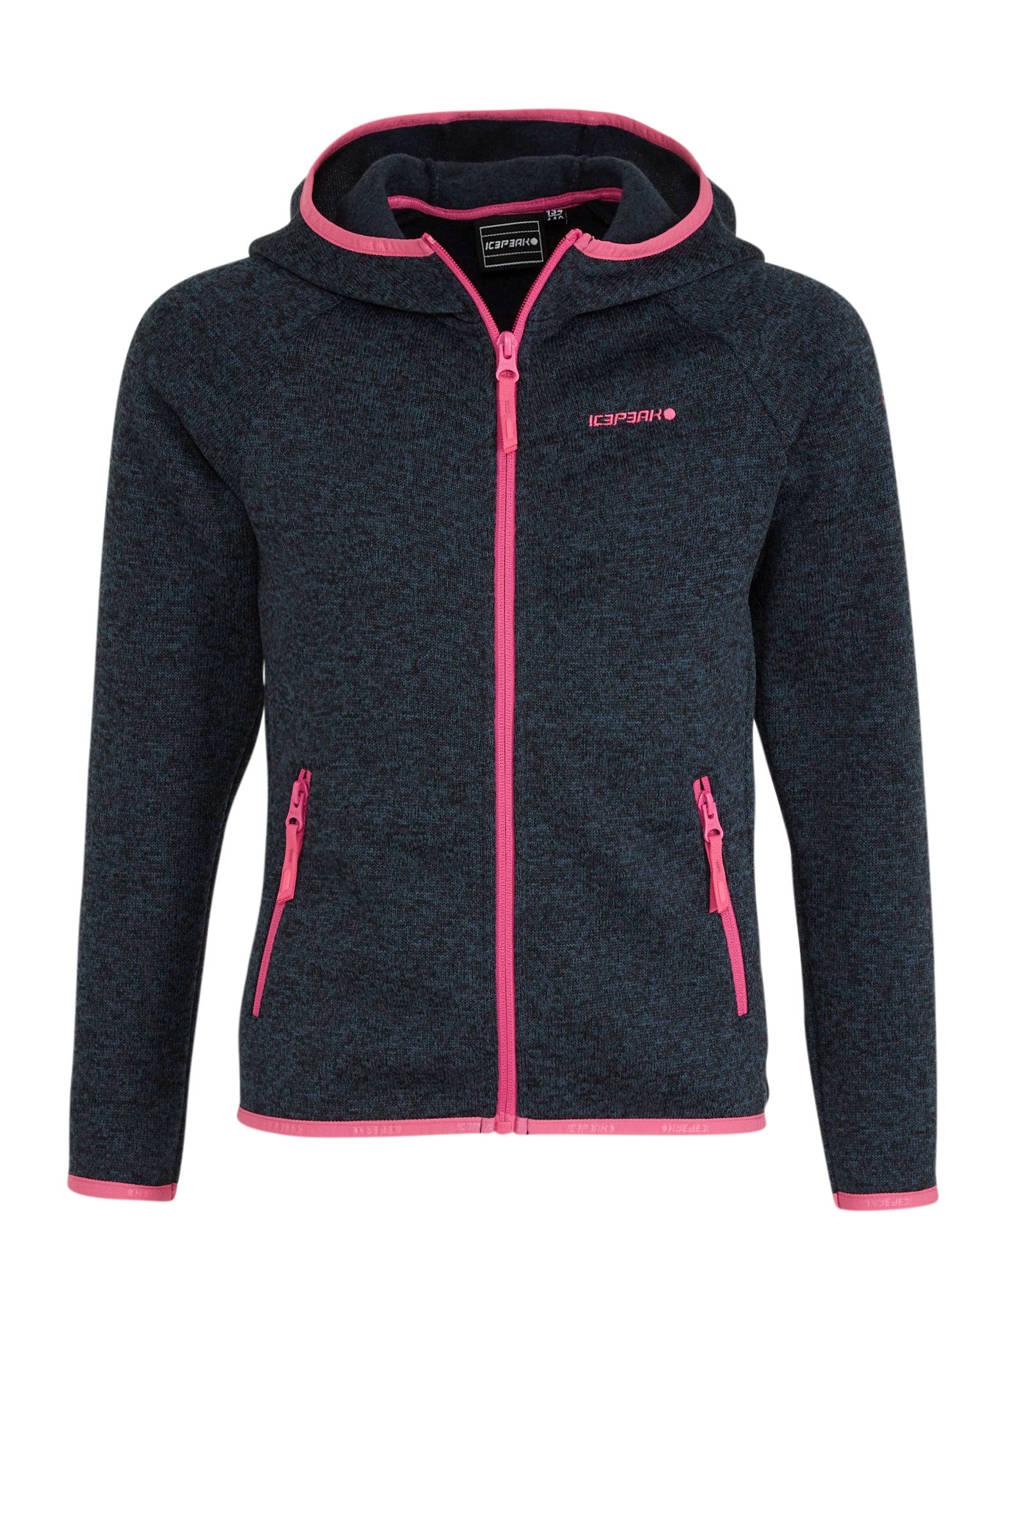 Icepeak vest Kuna Jr. donkerblauw/roze, Donkerblauw/roze